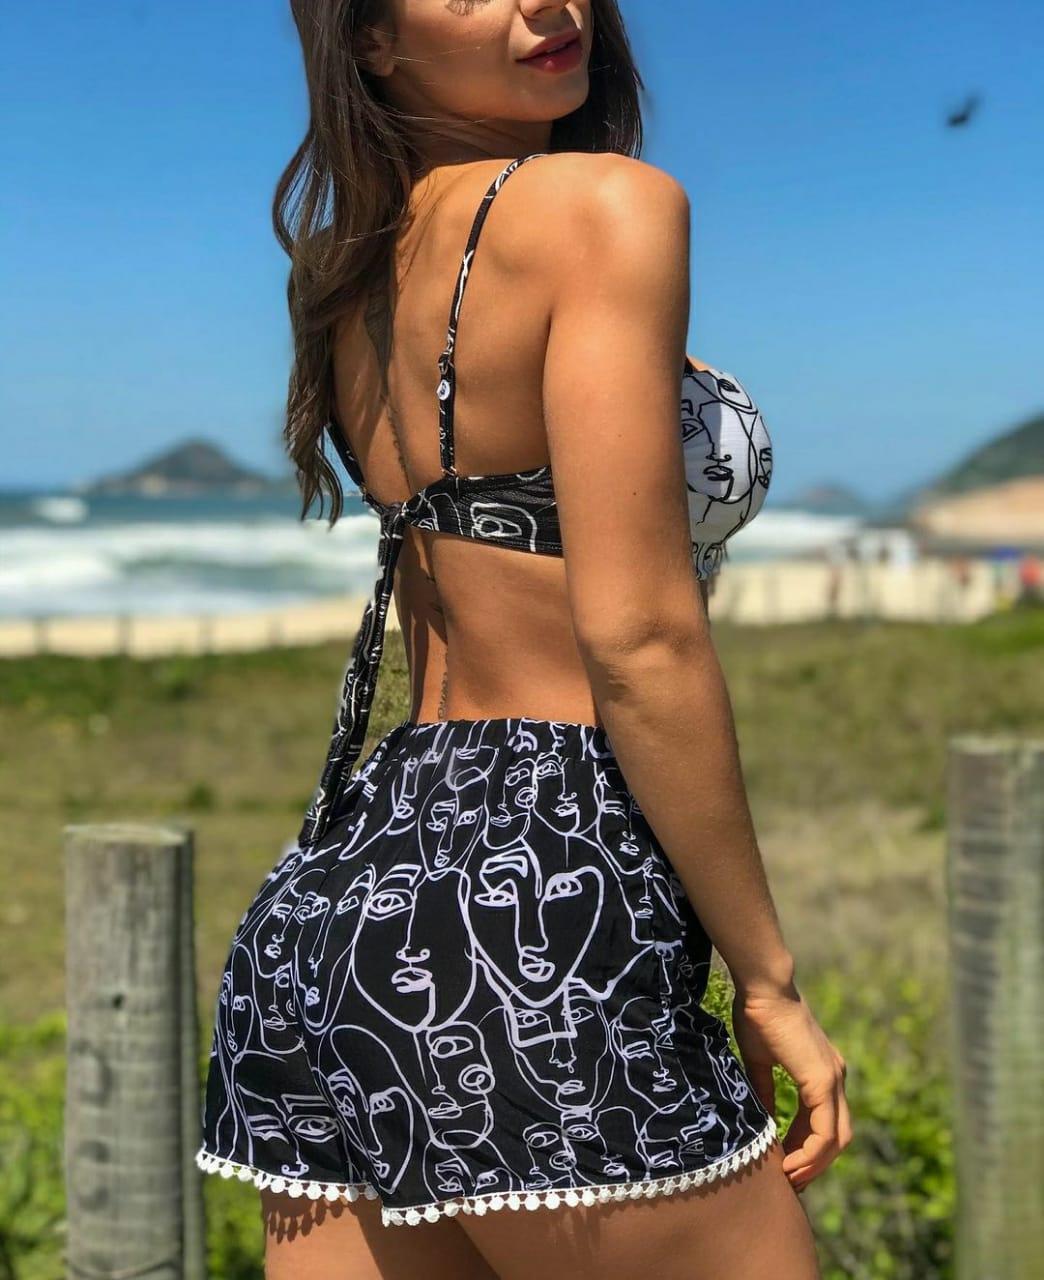 Shorts saída de praia preto e branco pompons